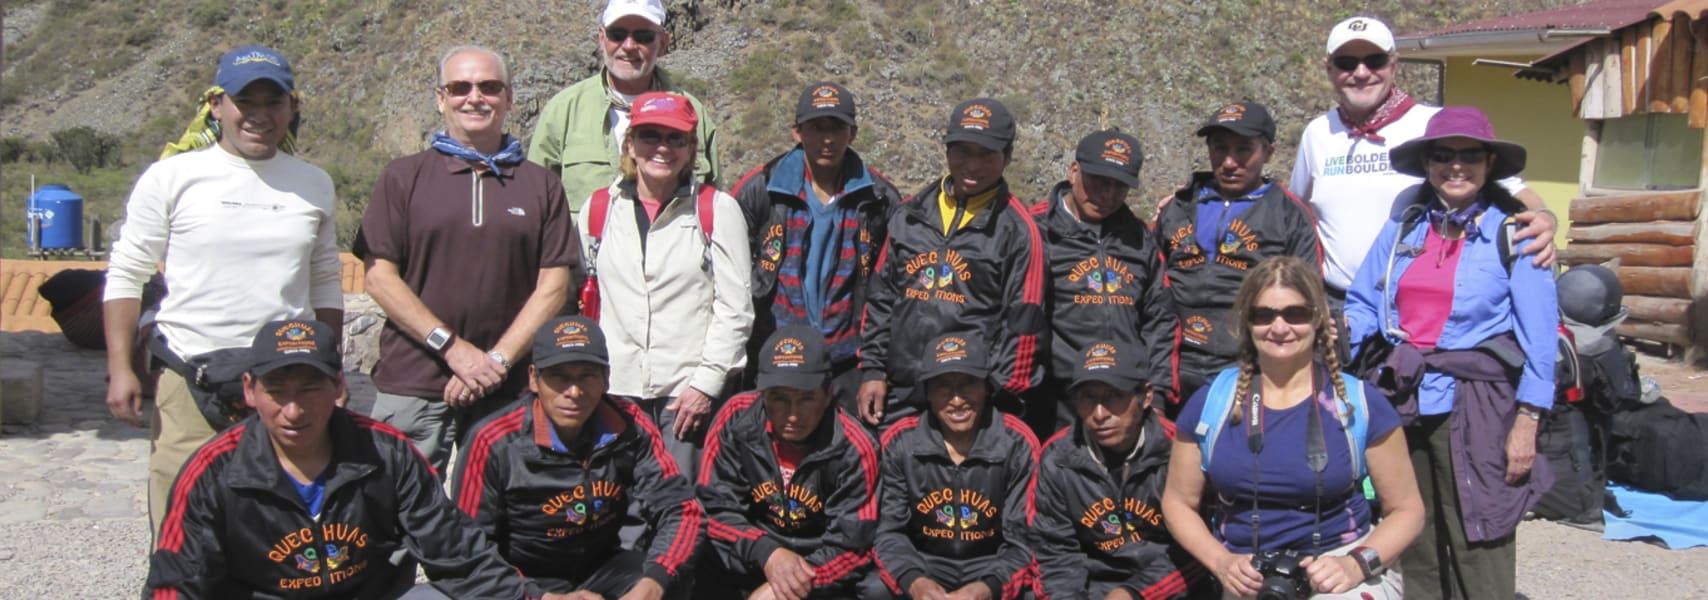 Quechuas Expeditions Cusco Peru undefined